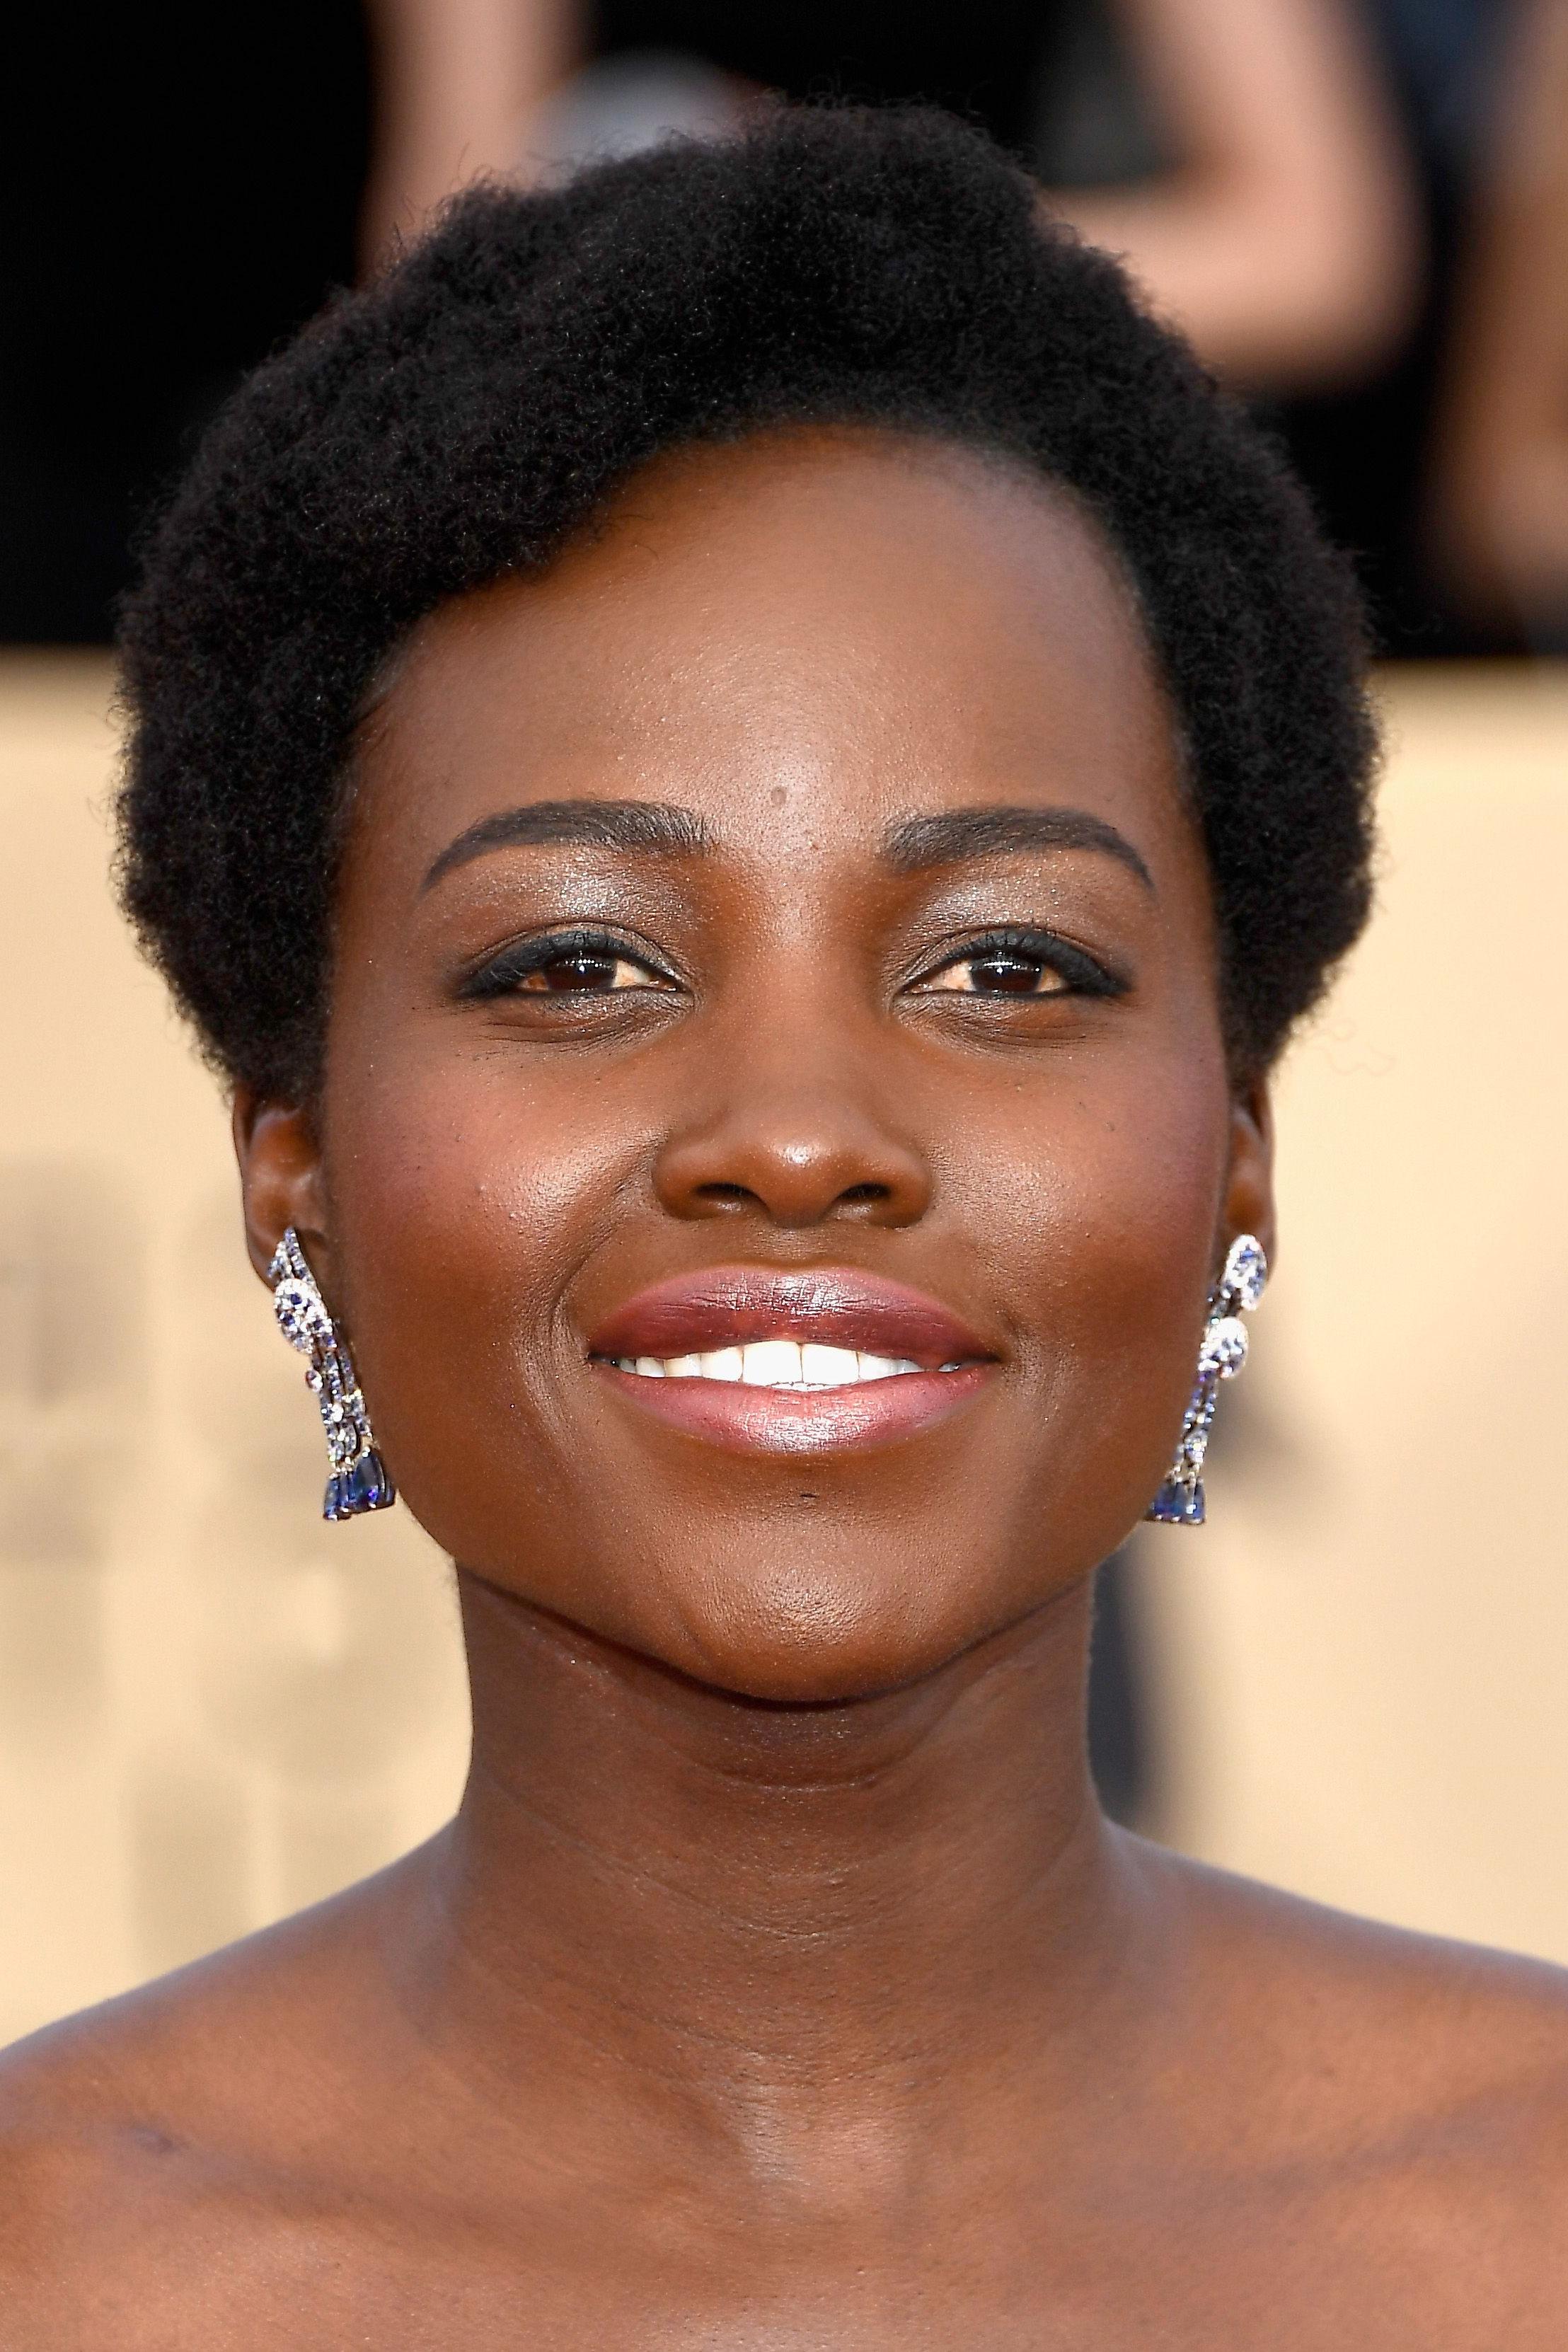 20 Celebrity Short Curly Hair Ideas – Short Haircuts And Hairstyles Within Curly Short Hairstyles For Black Women (View 20 of 25)